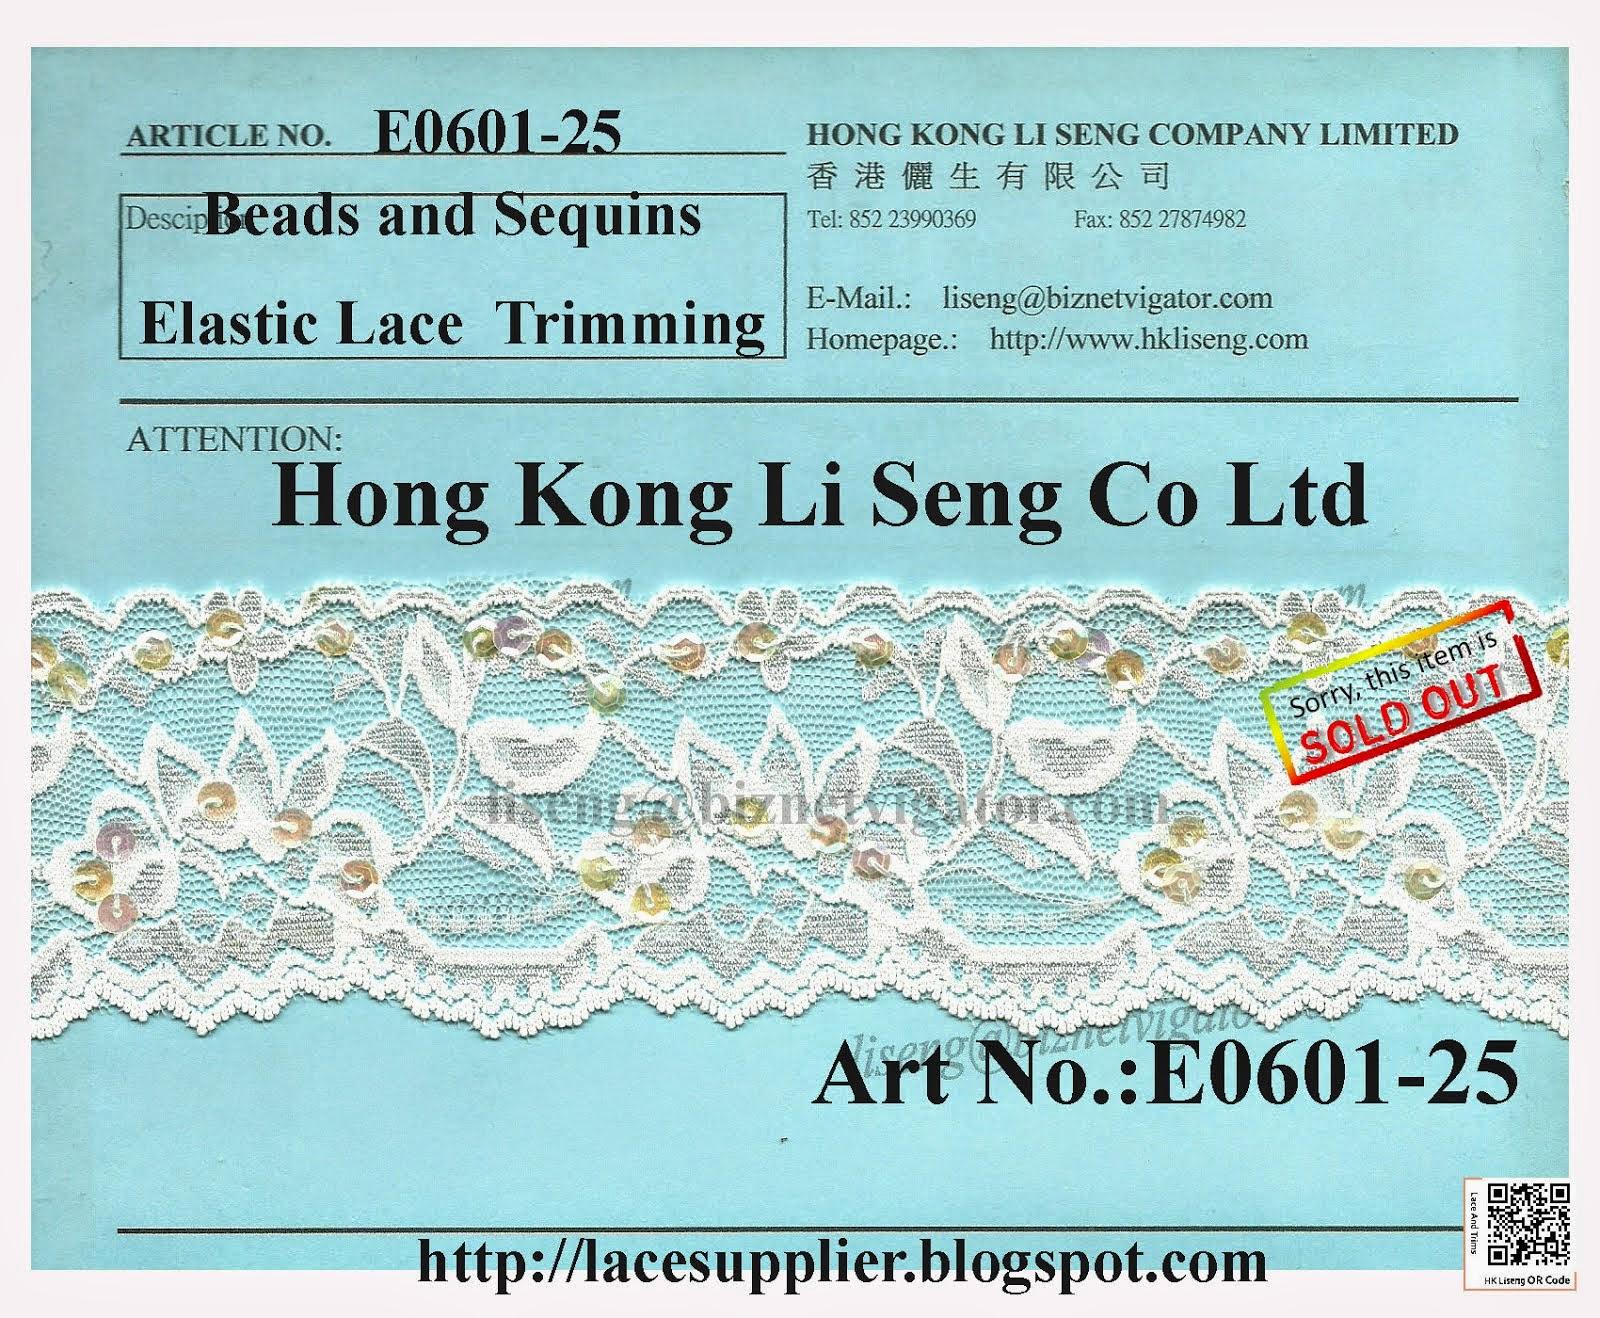 Elastic Lace With Beads and Sequins Manufacturer - Hong Kong Li Seng Co Ltd